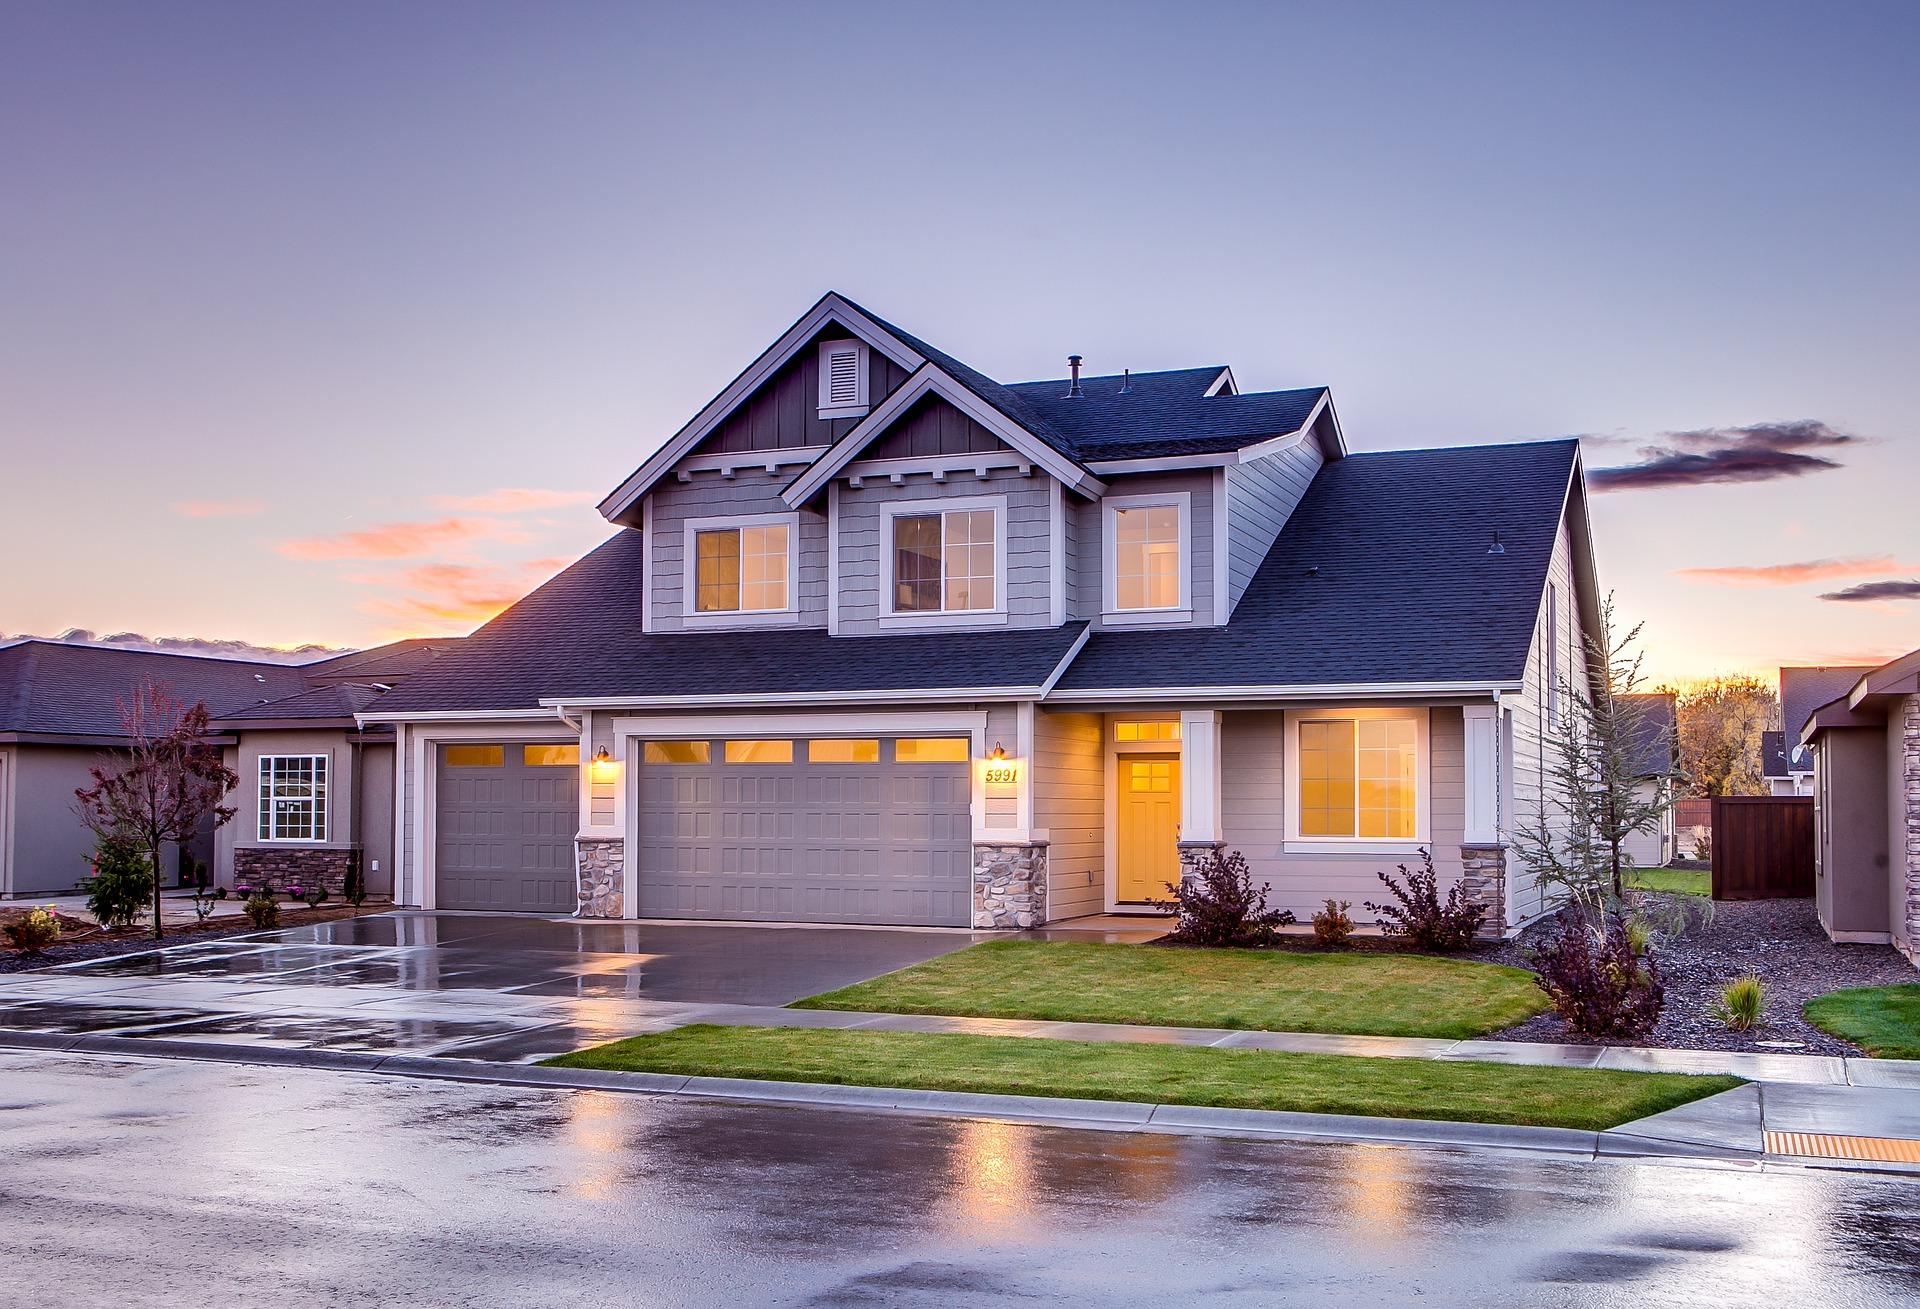 best-real-estate-agent-first-time-buyer-specialist-fairfax-va-usa